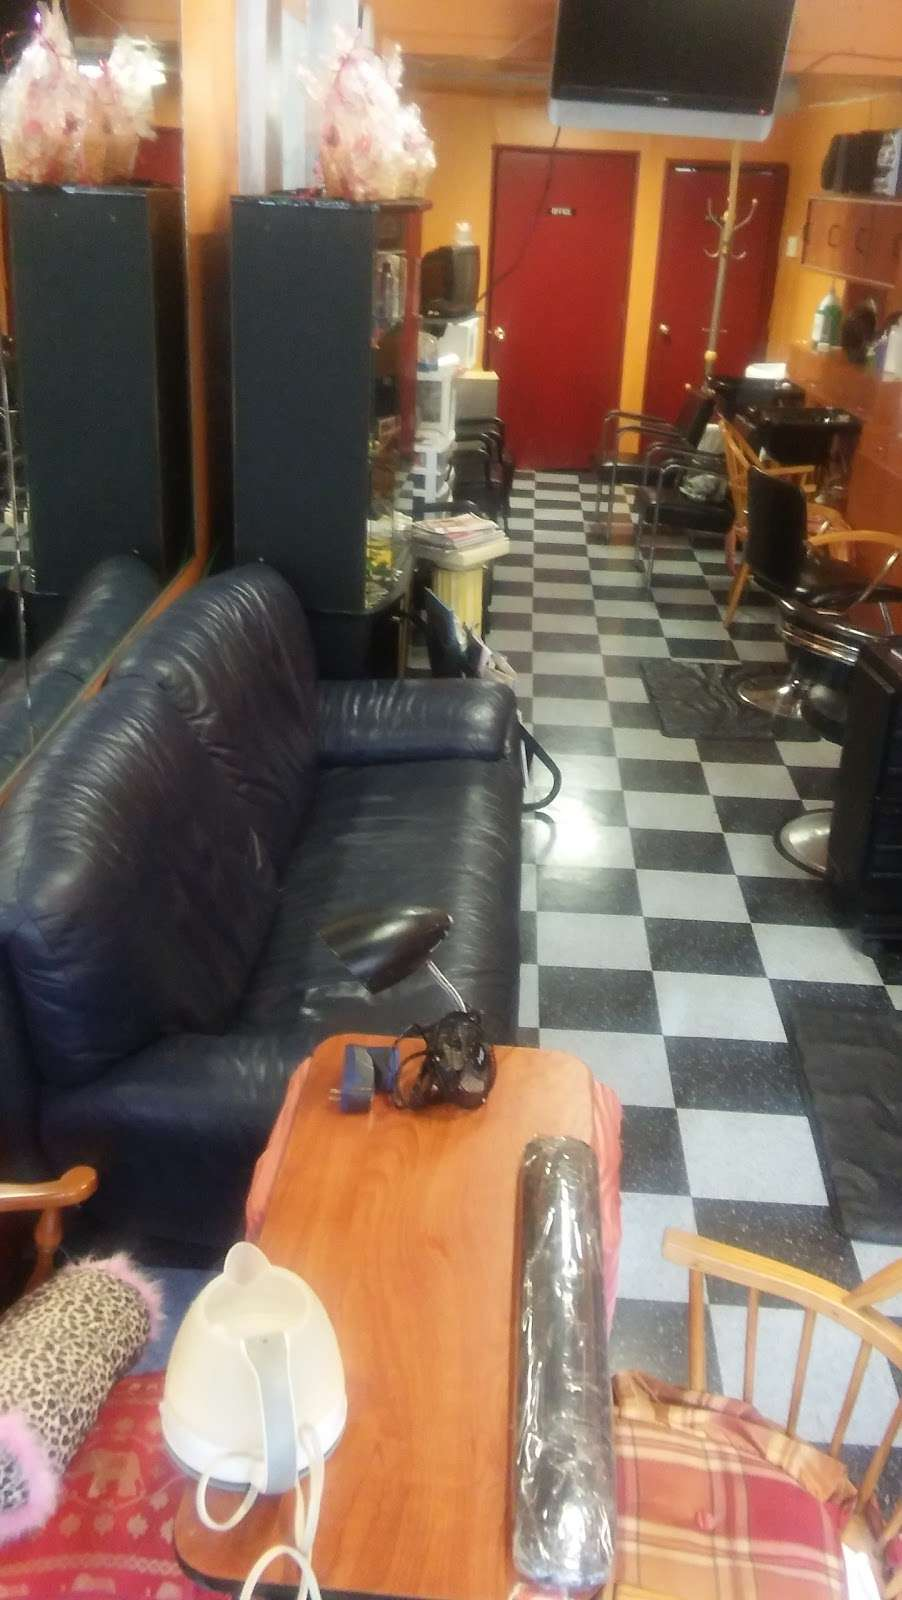 Posh Unisex Beauty Salon - hair care    Photo 10 of 10   Address: Springdale Ave, East Orange, NJ 07017, USA   Phone: (973) 519-1990